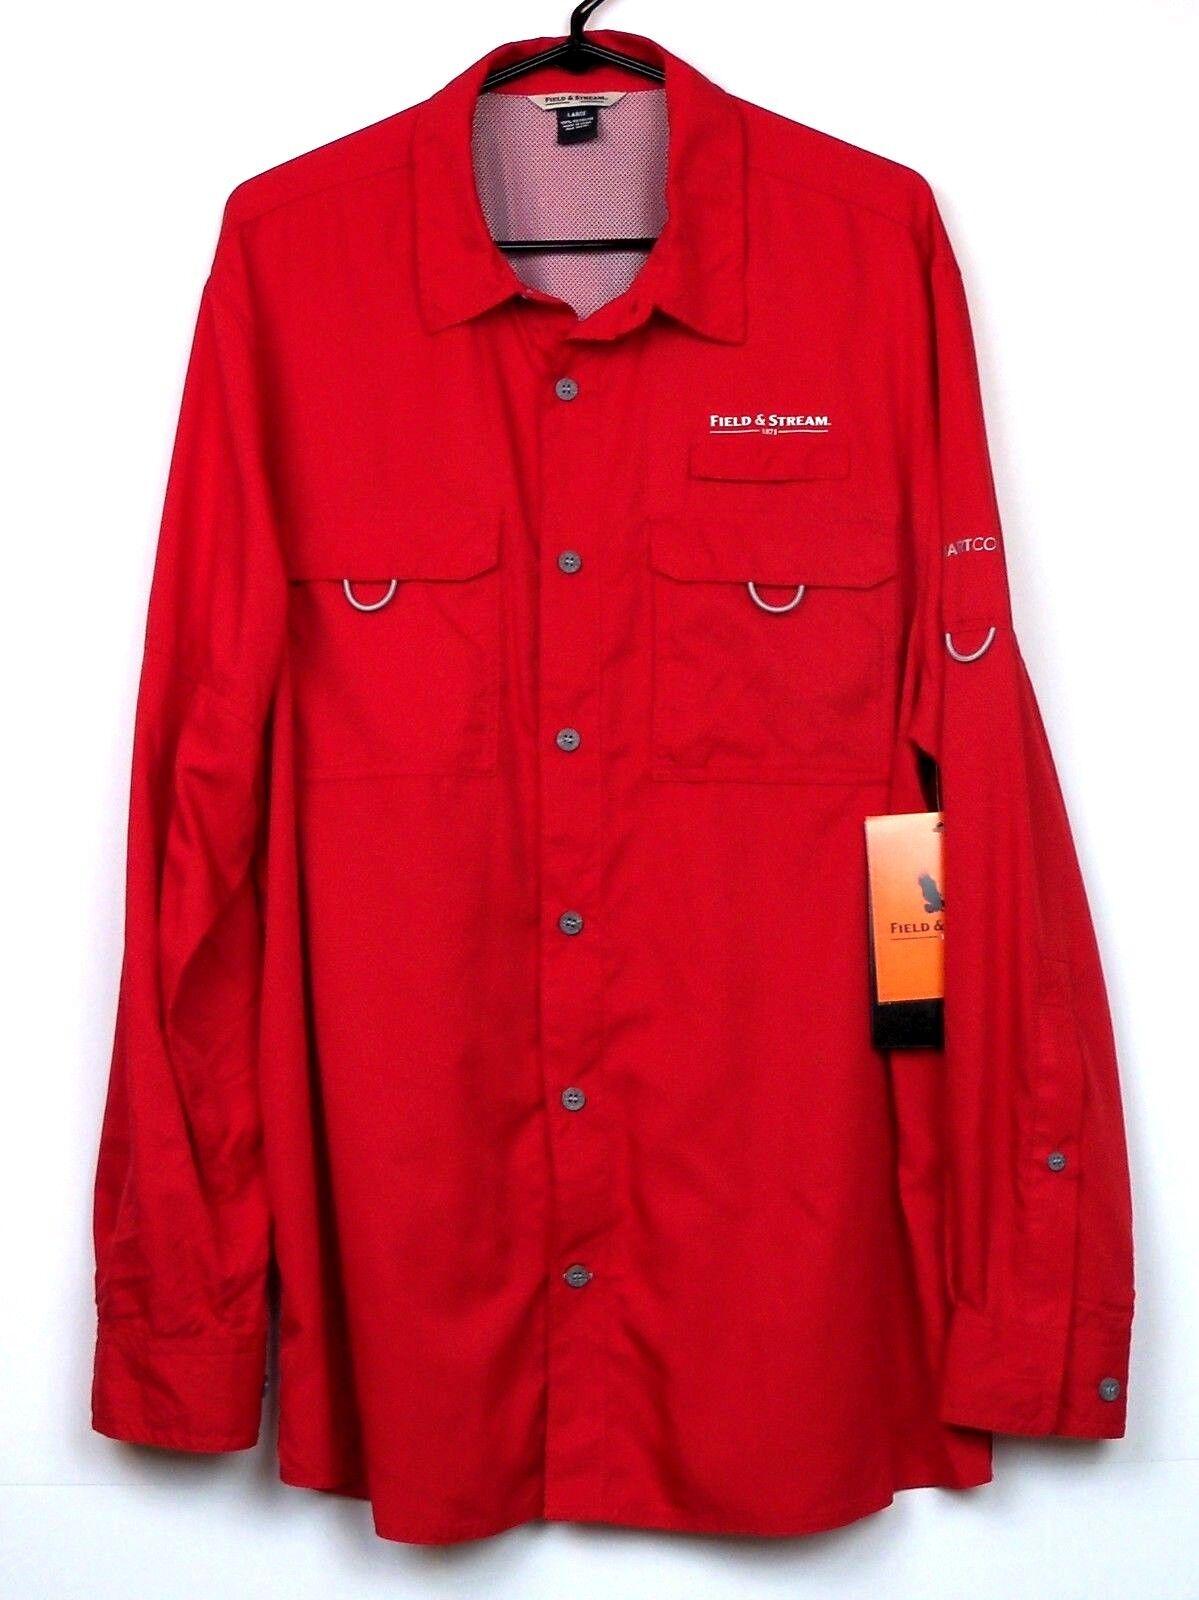 Field & Stream Uomo Latitude Castlite Smart Cool L Shirt NWT Barbados Cherry L Cool 0a7a9a